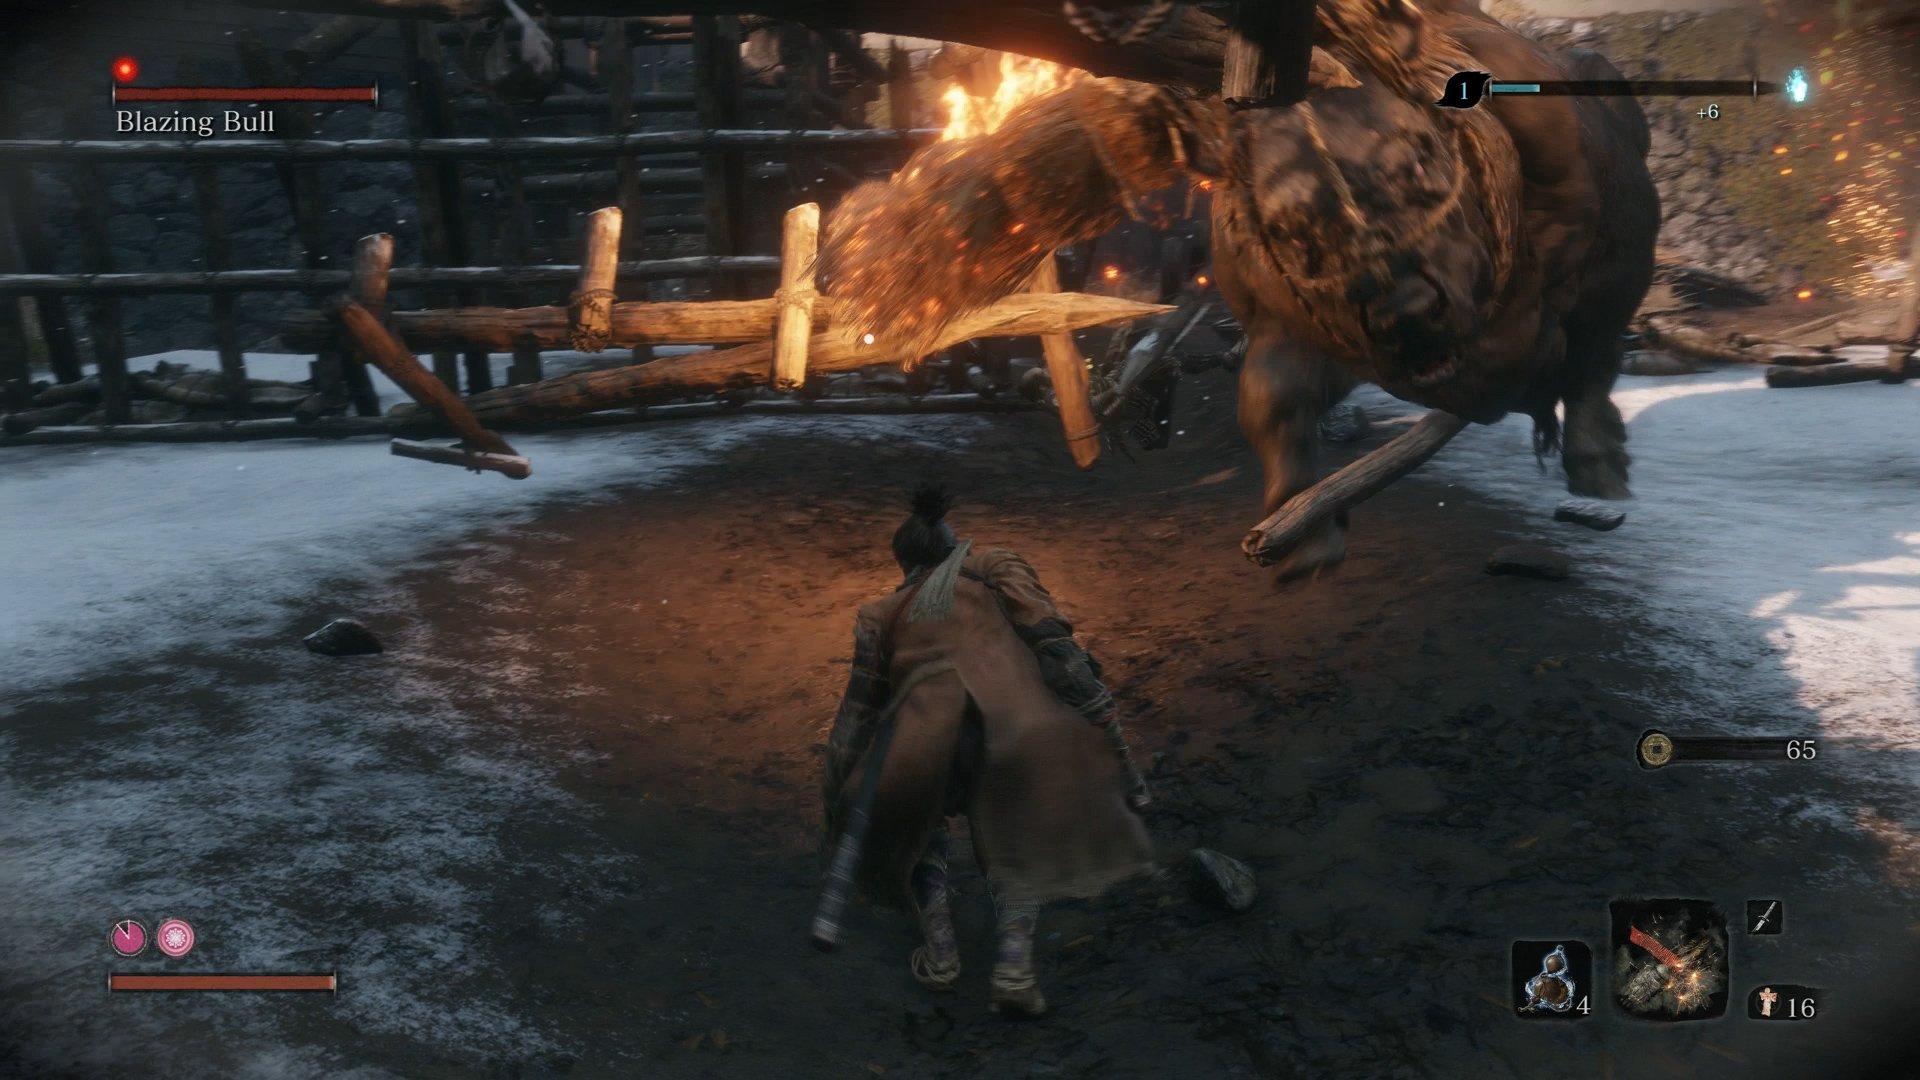 Blazing Bull Sekiro